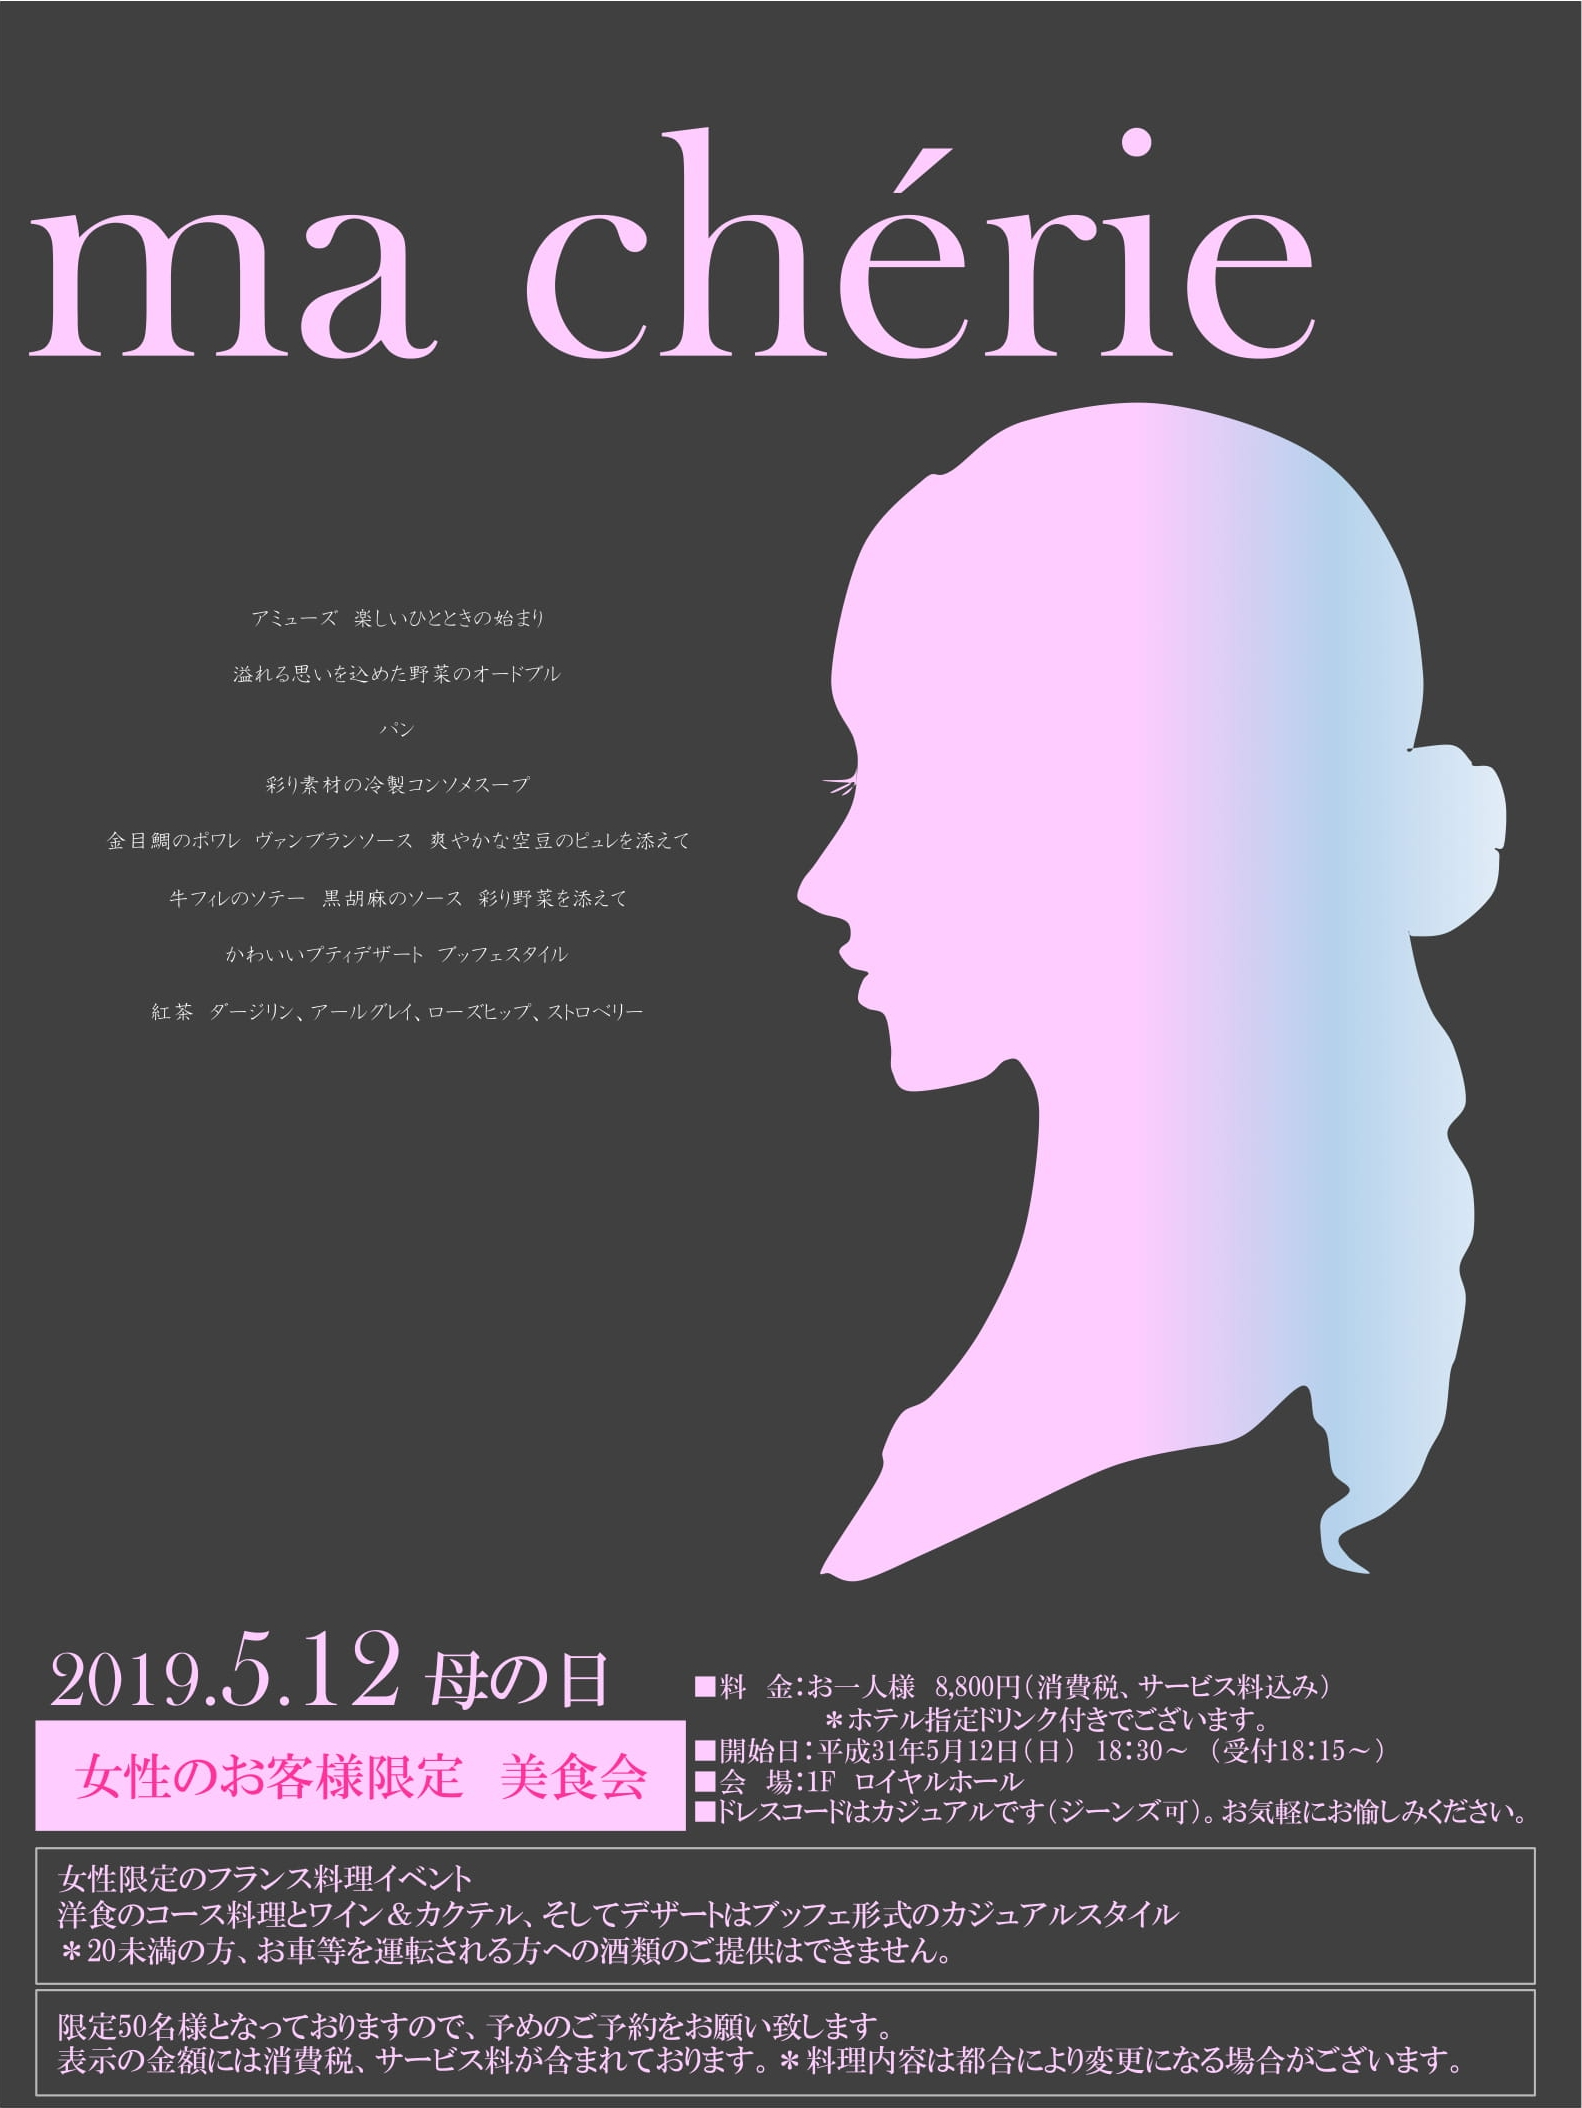 Hotel & Resorts MINAMIBOSO 女性限定『ma cherie -マ シェリ-』